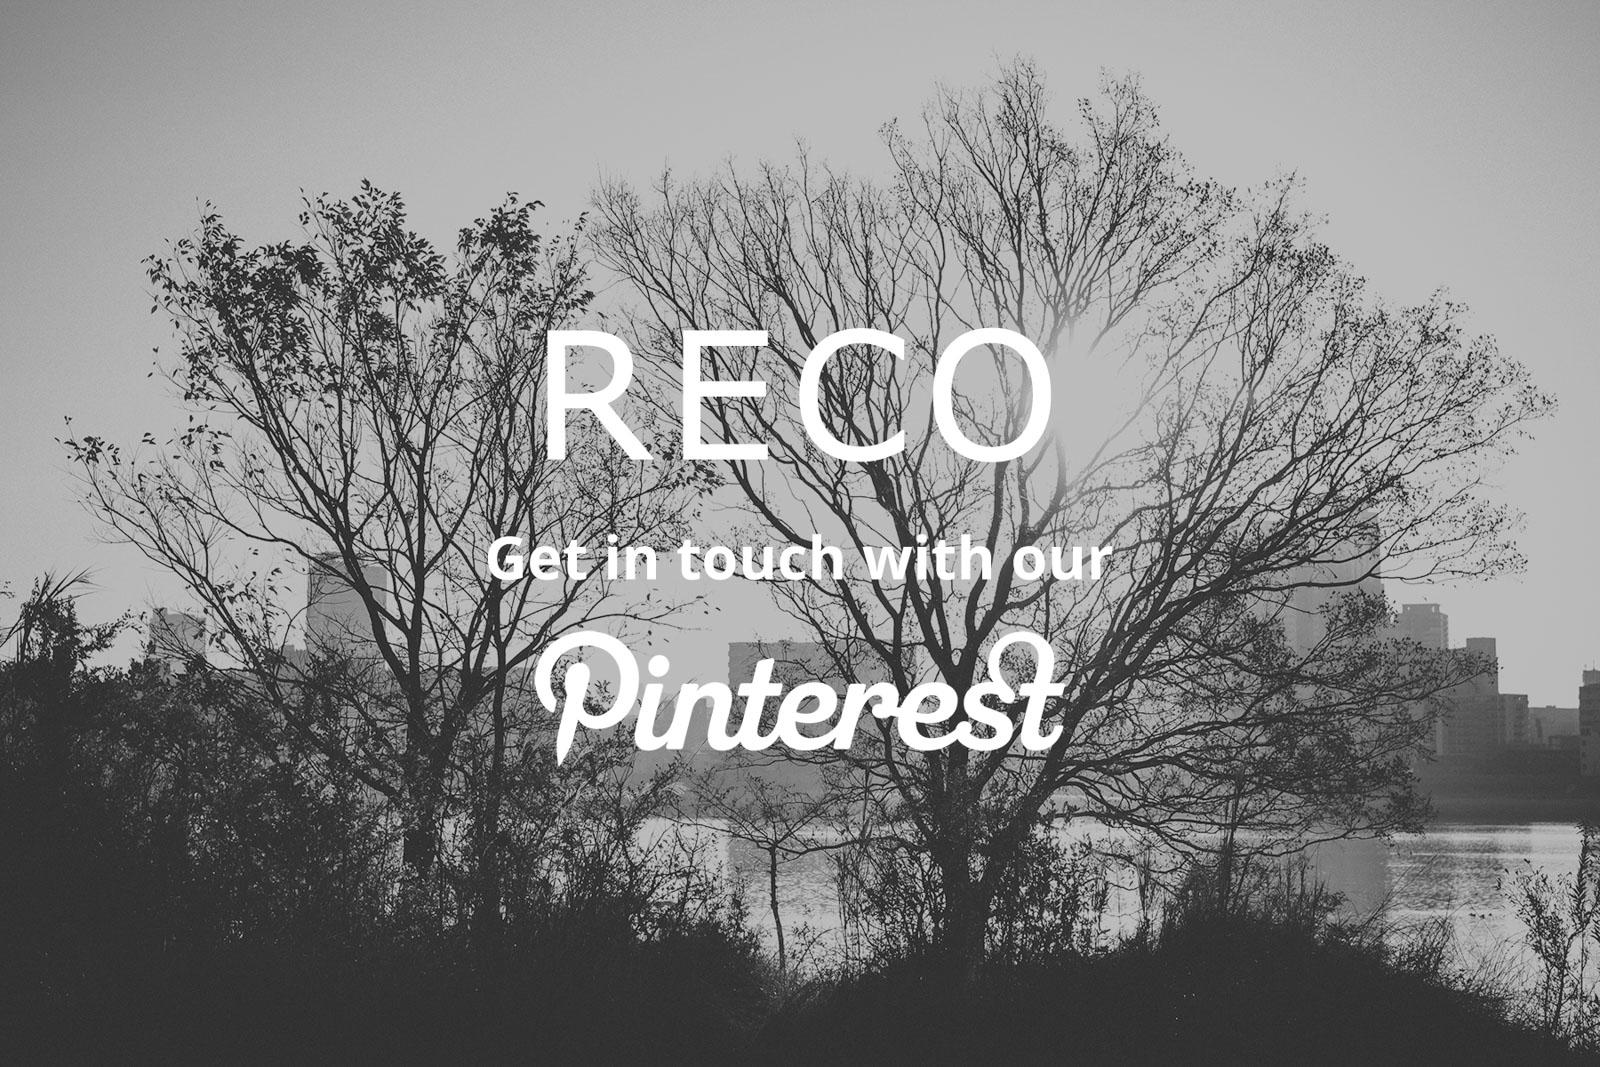 RECO_Piterest